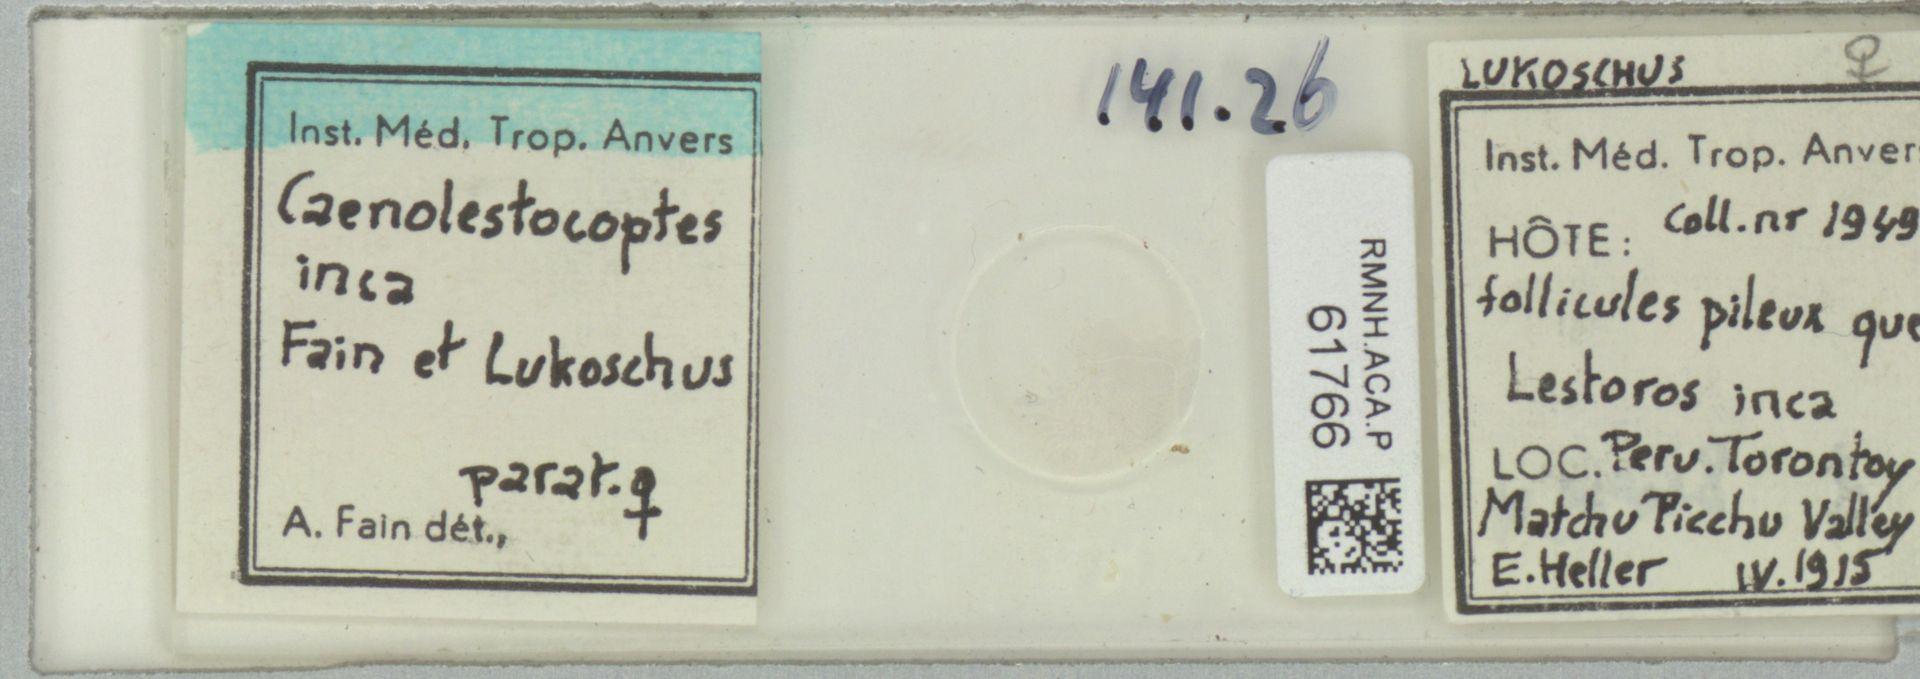 RMNH.ACA.P.61766 | Caenolestocoptes inca Fain & Lukoschus